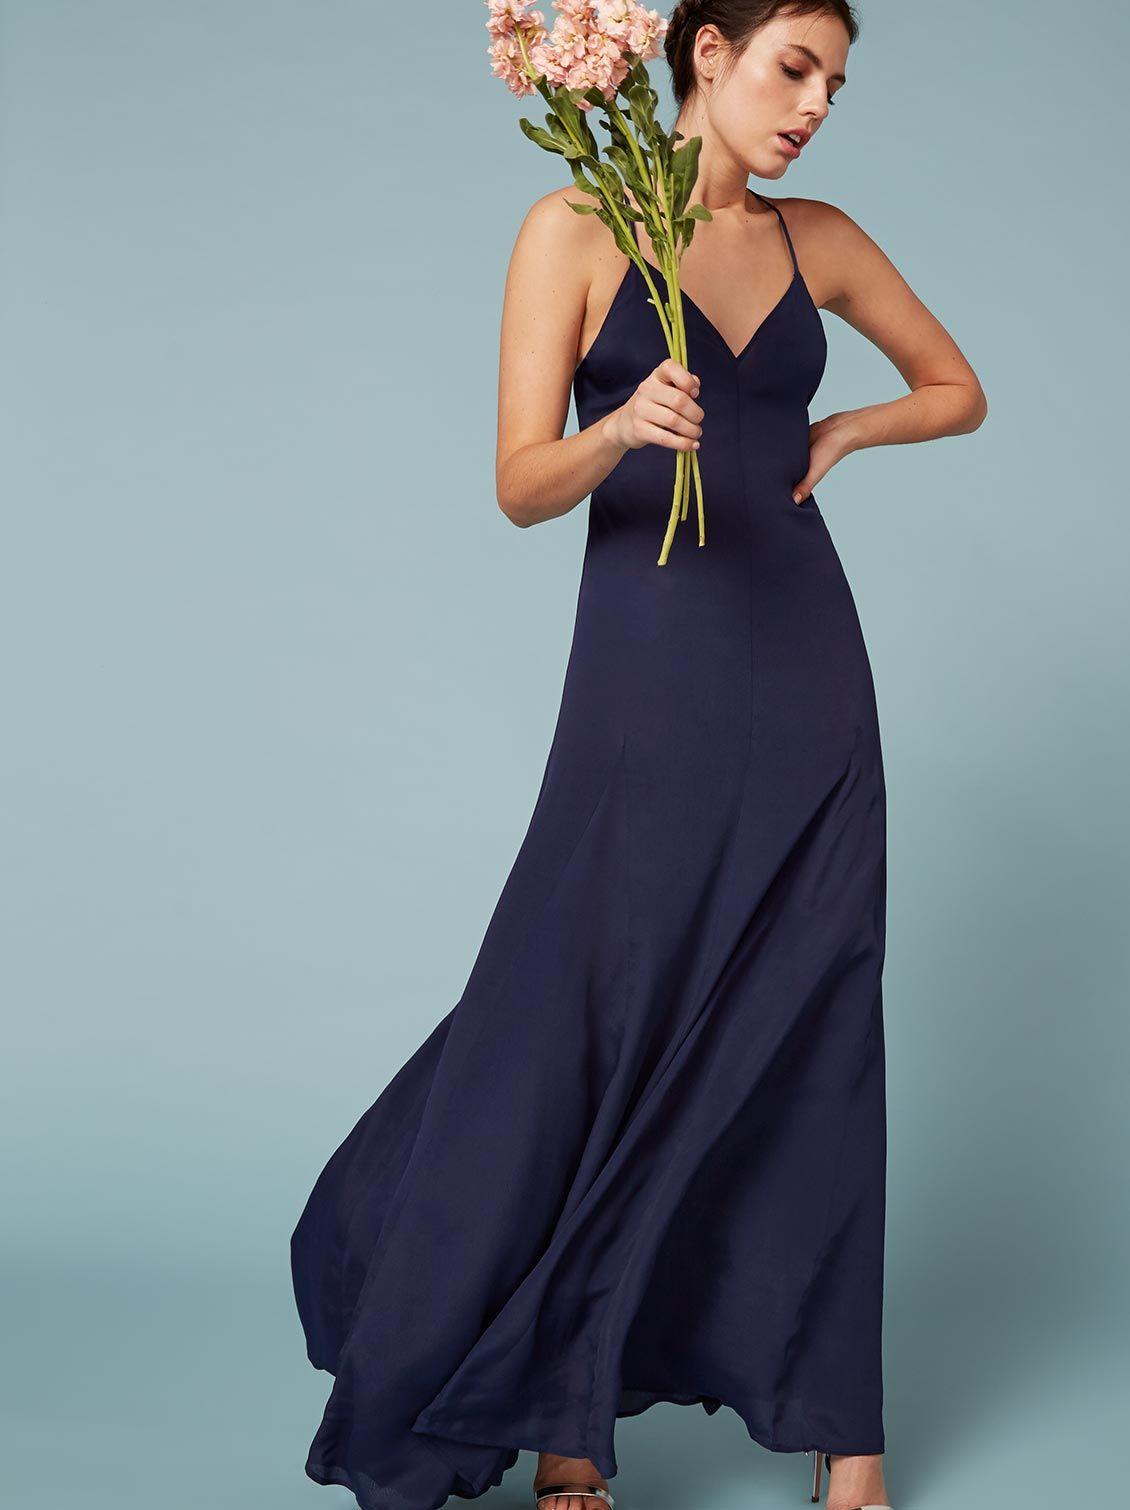 Arabeth dress sapphire 1 clp | Fashion | Pinterest | Sapphire, Ugly ...